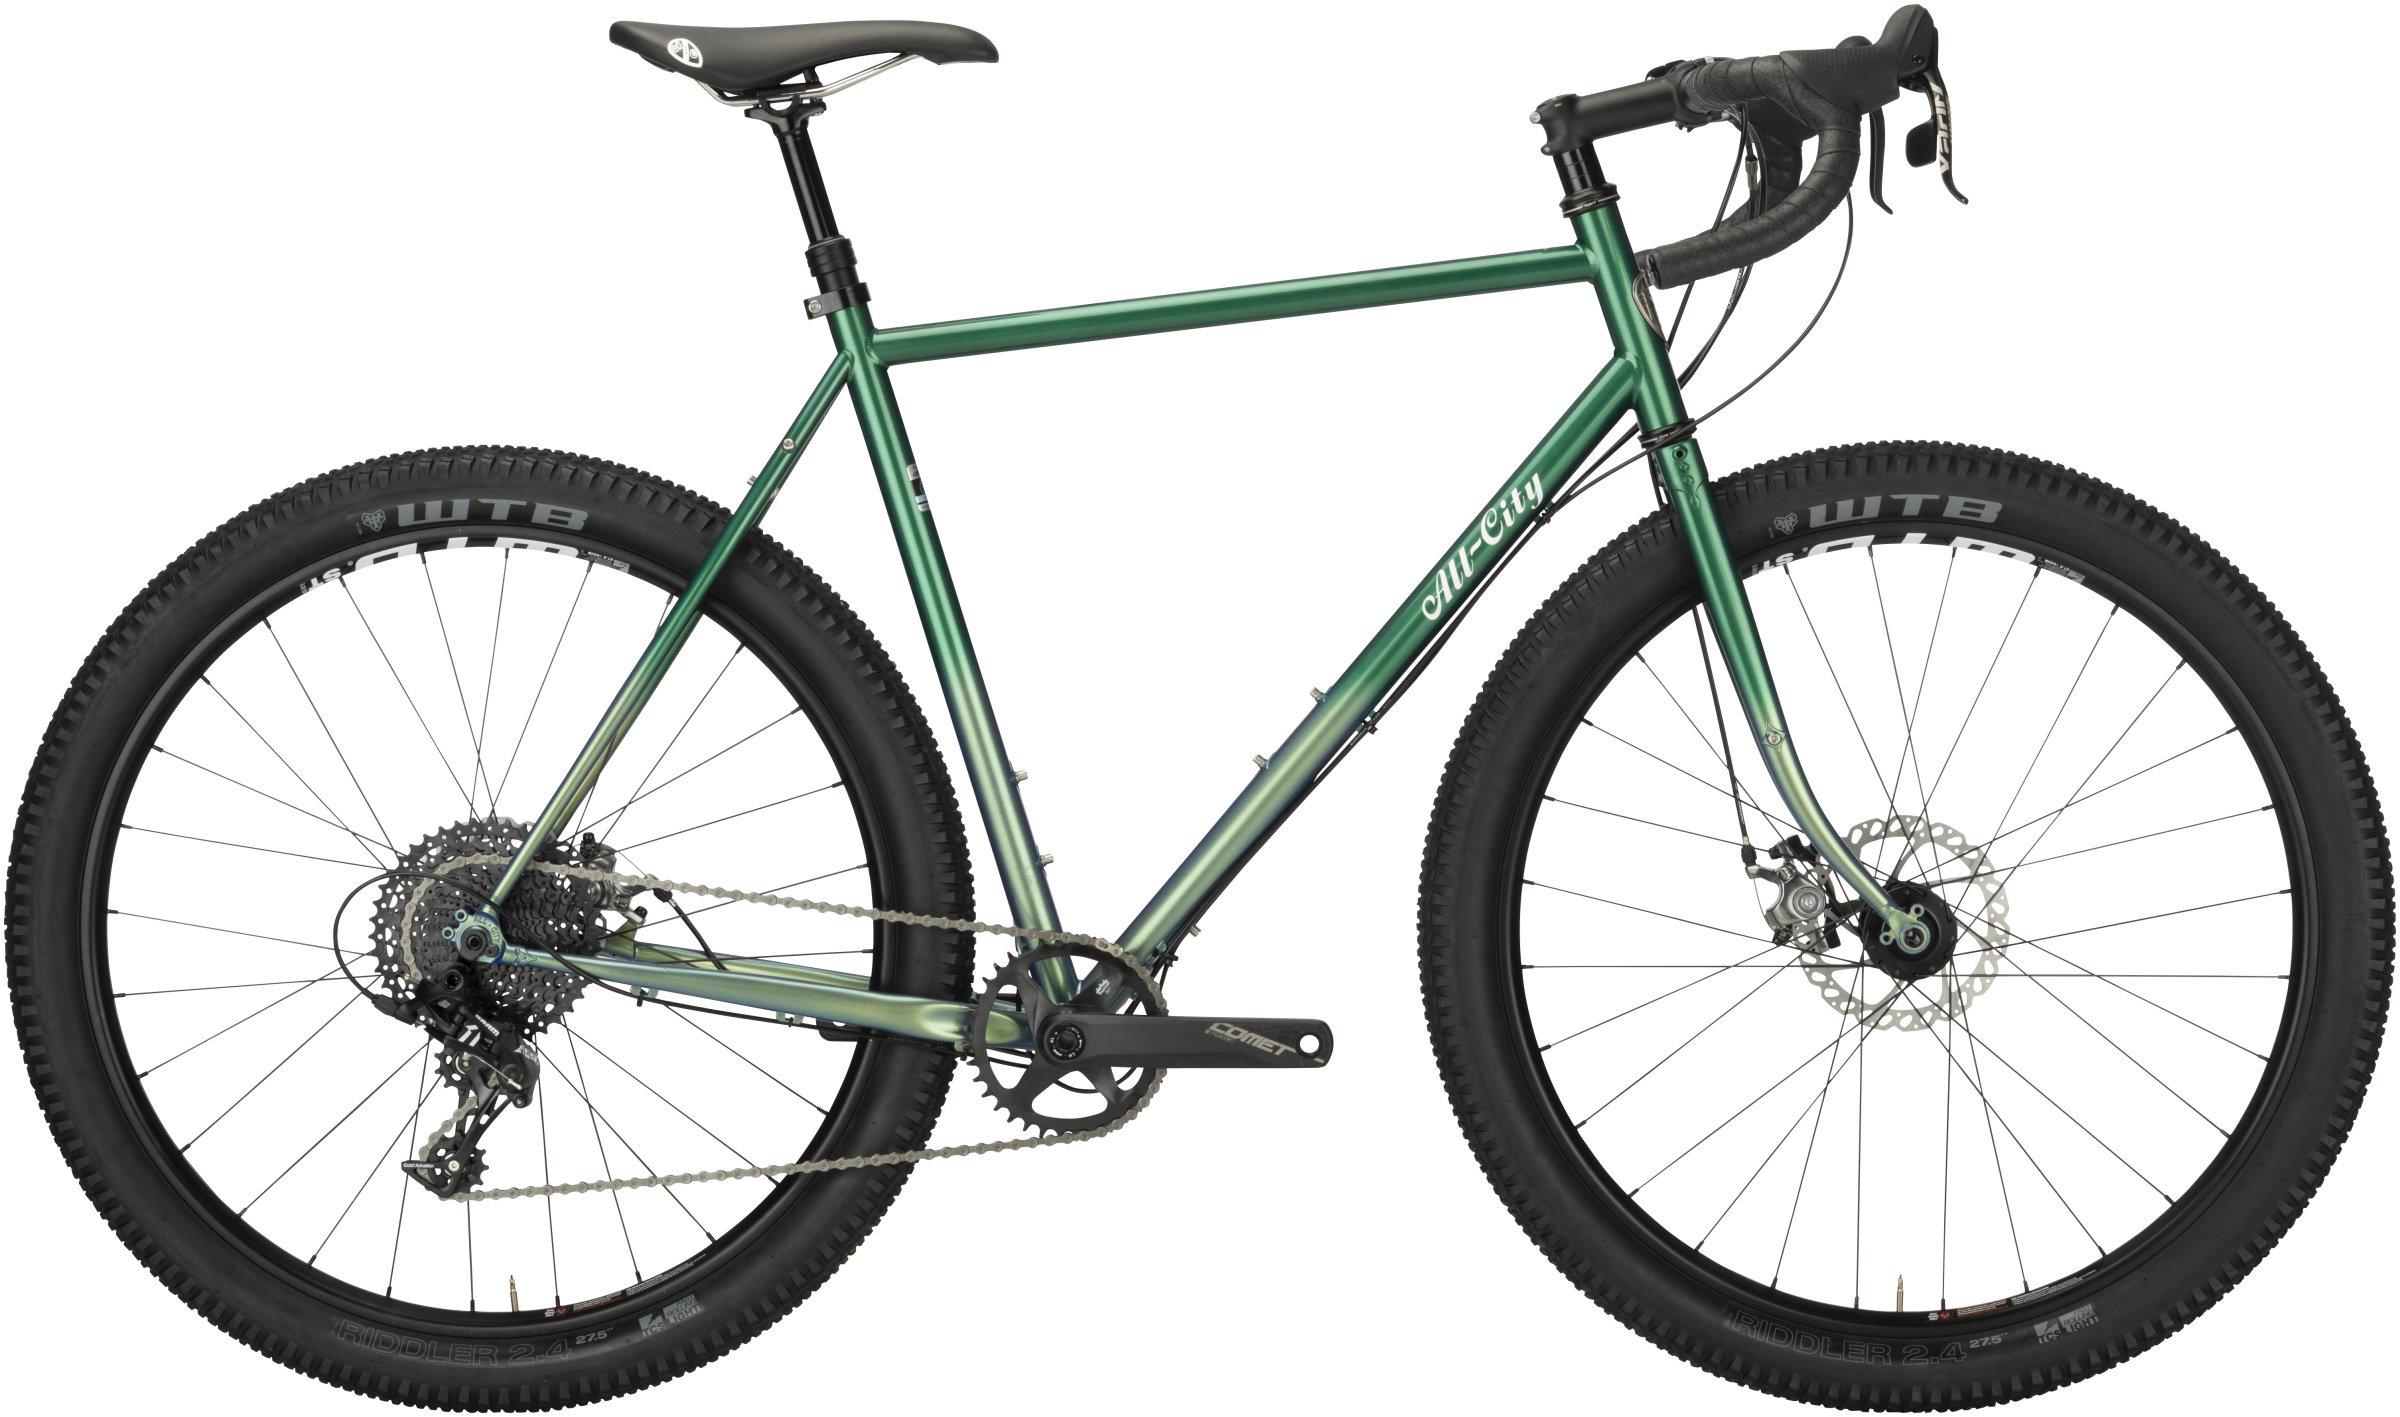 green all-city gorilla monsoon drop bar bikepacking bike